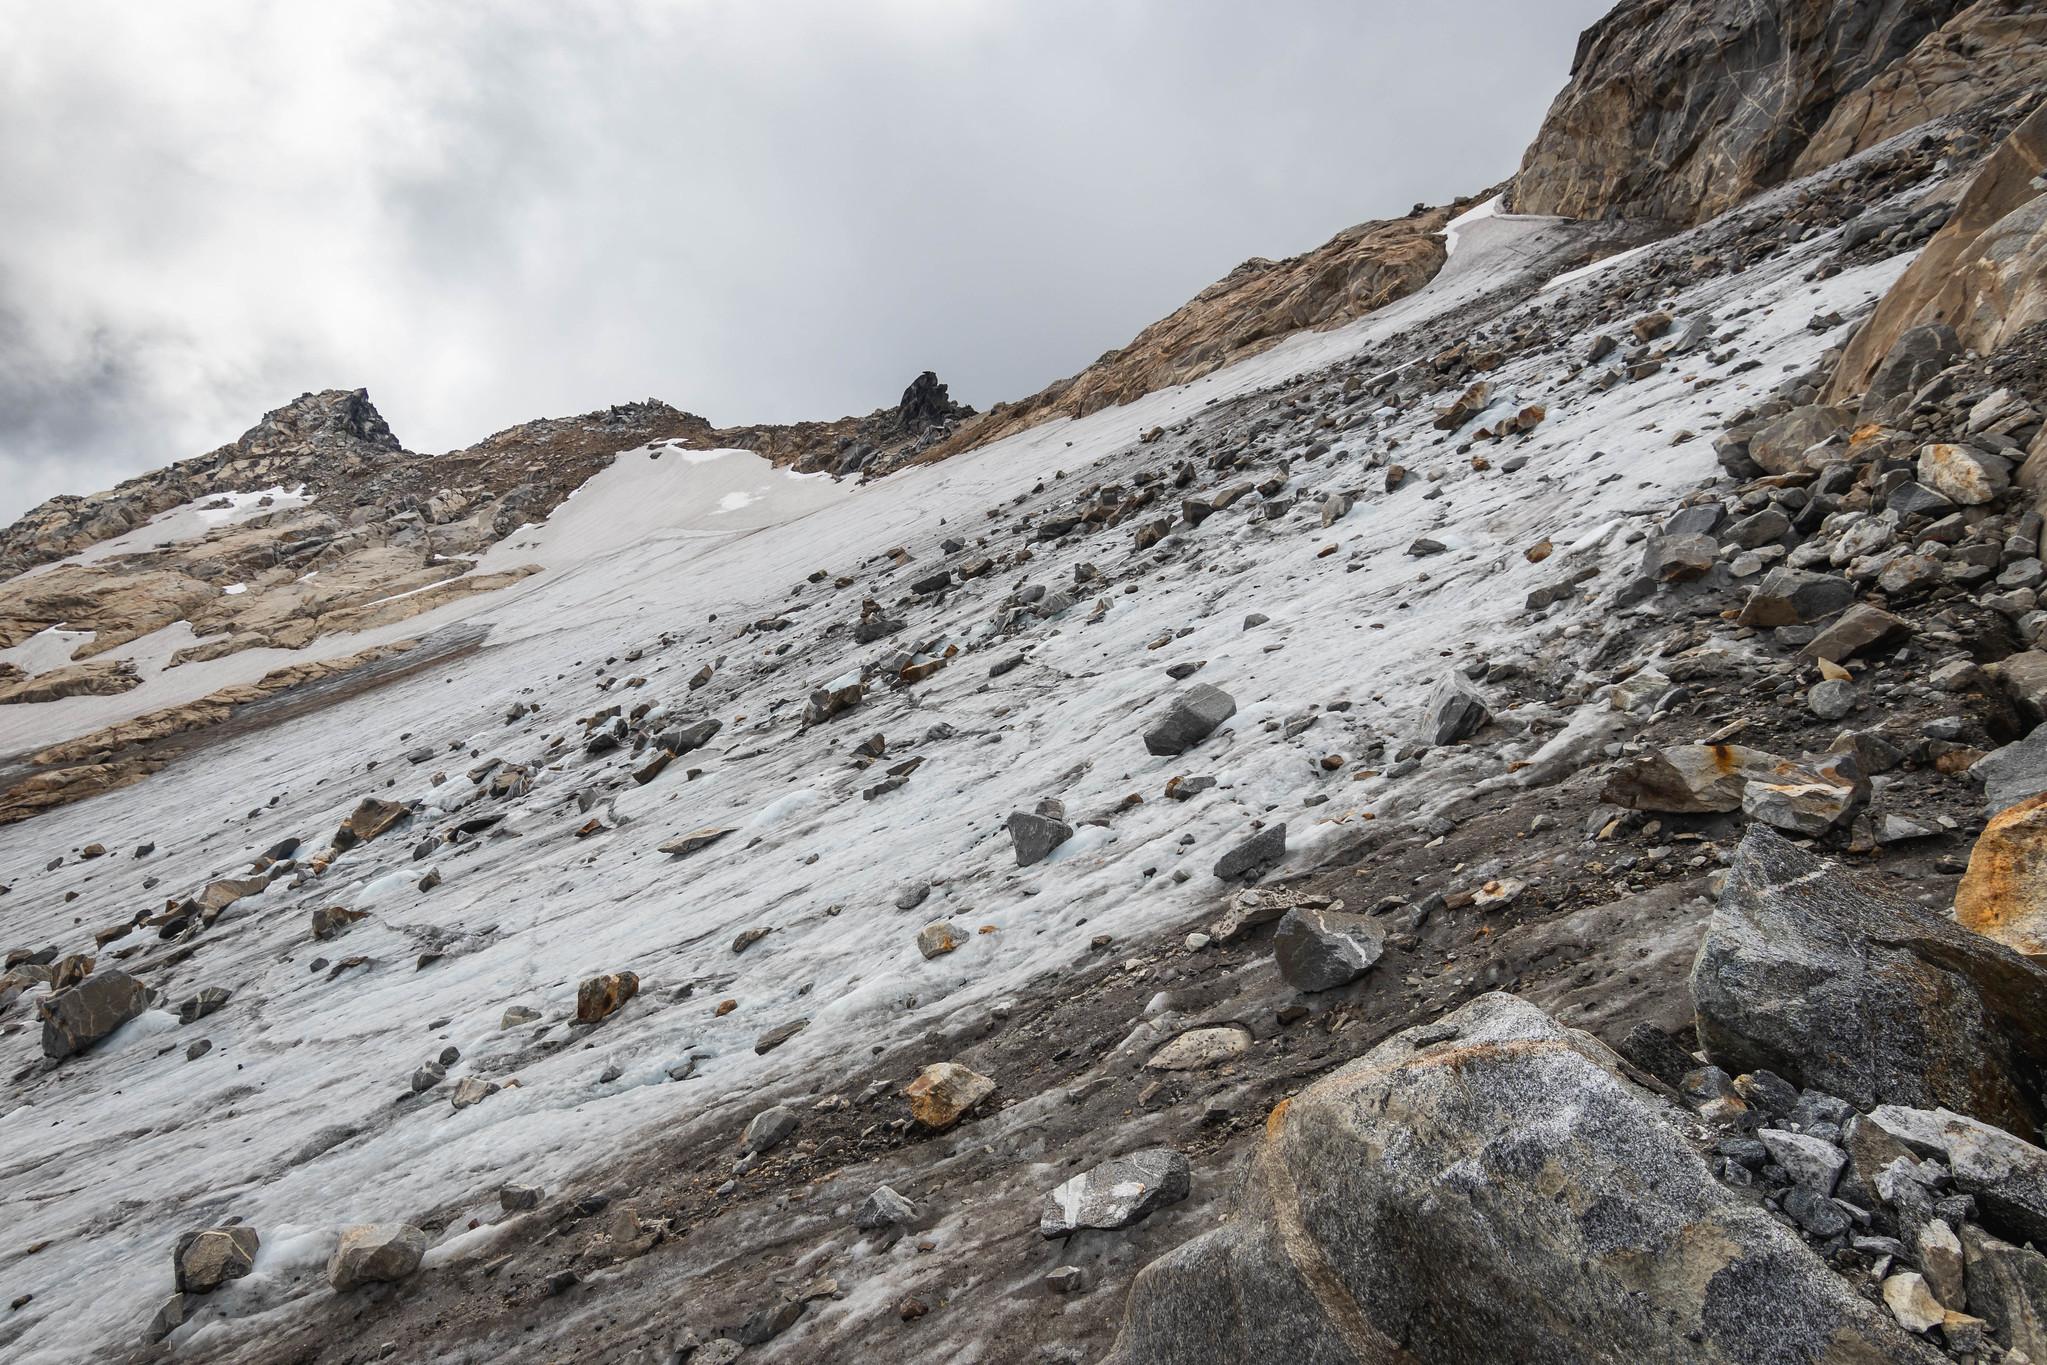 Beware of rockfalls